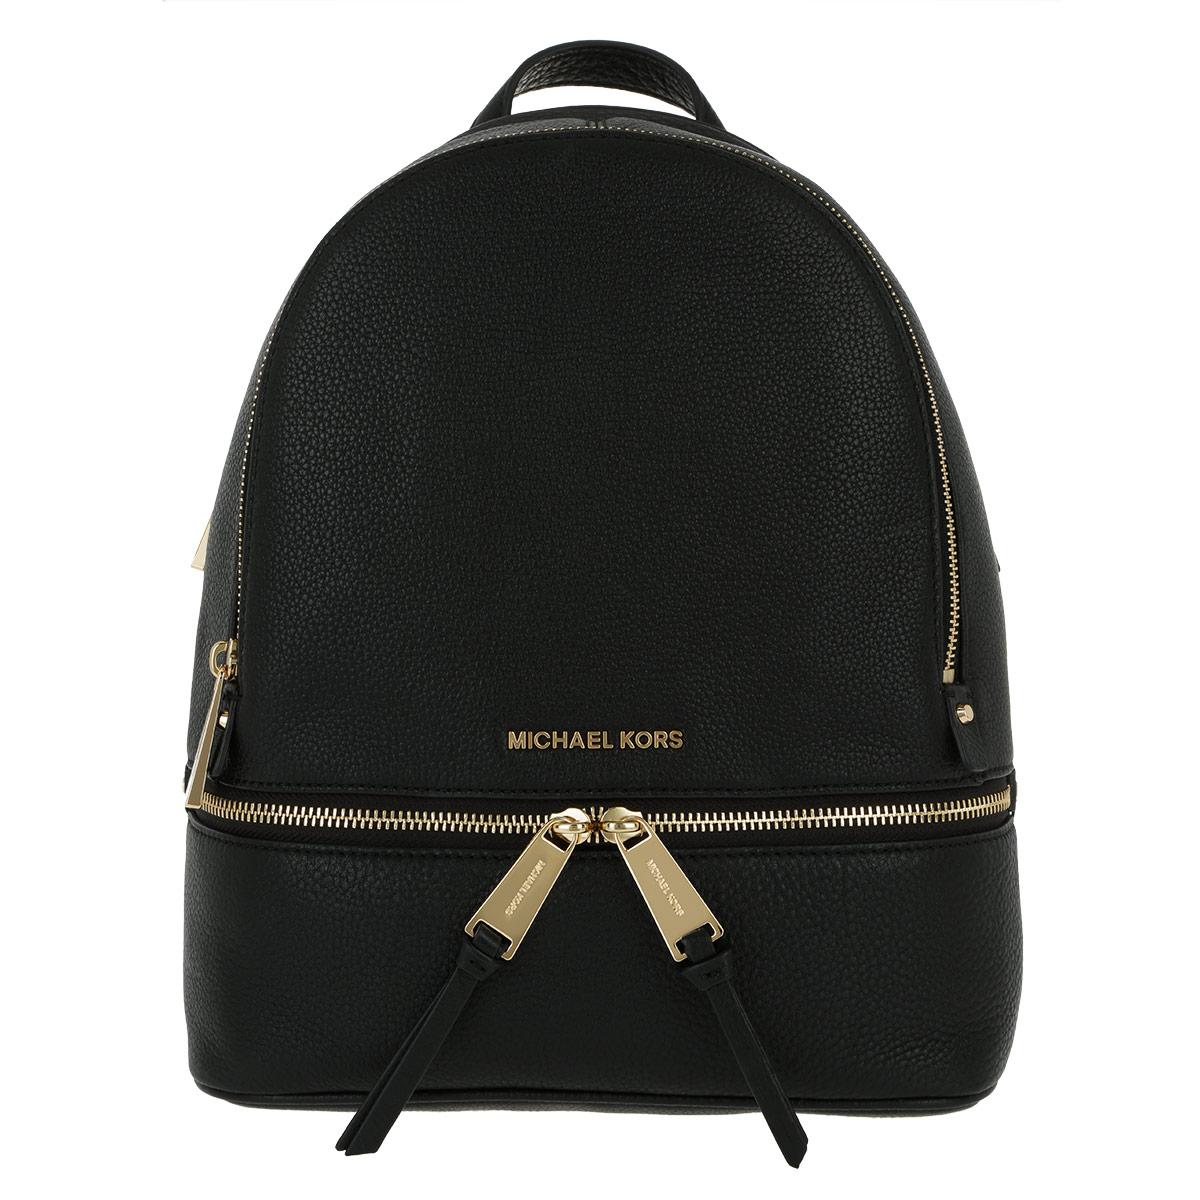 MICHAEL KORS Rhea Zip SM Back Pack Black